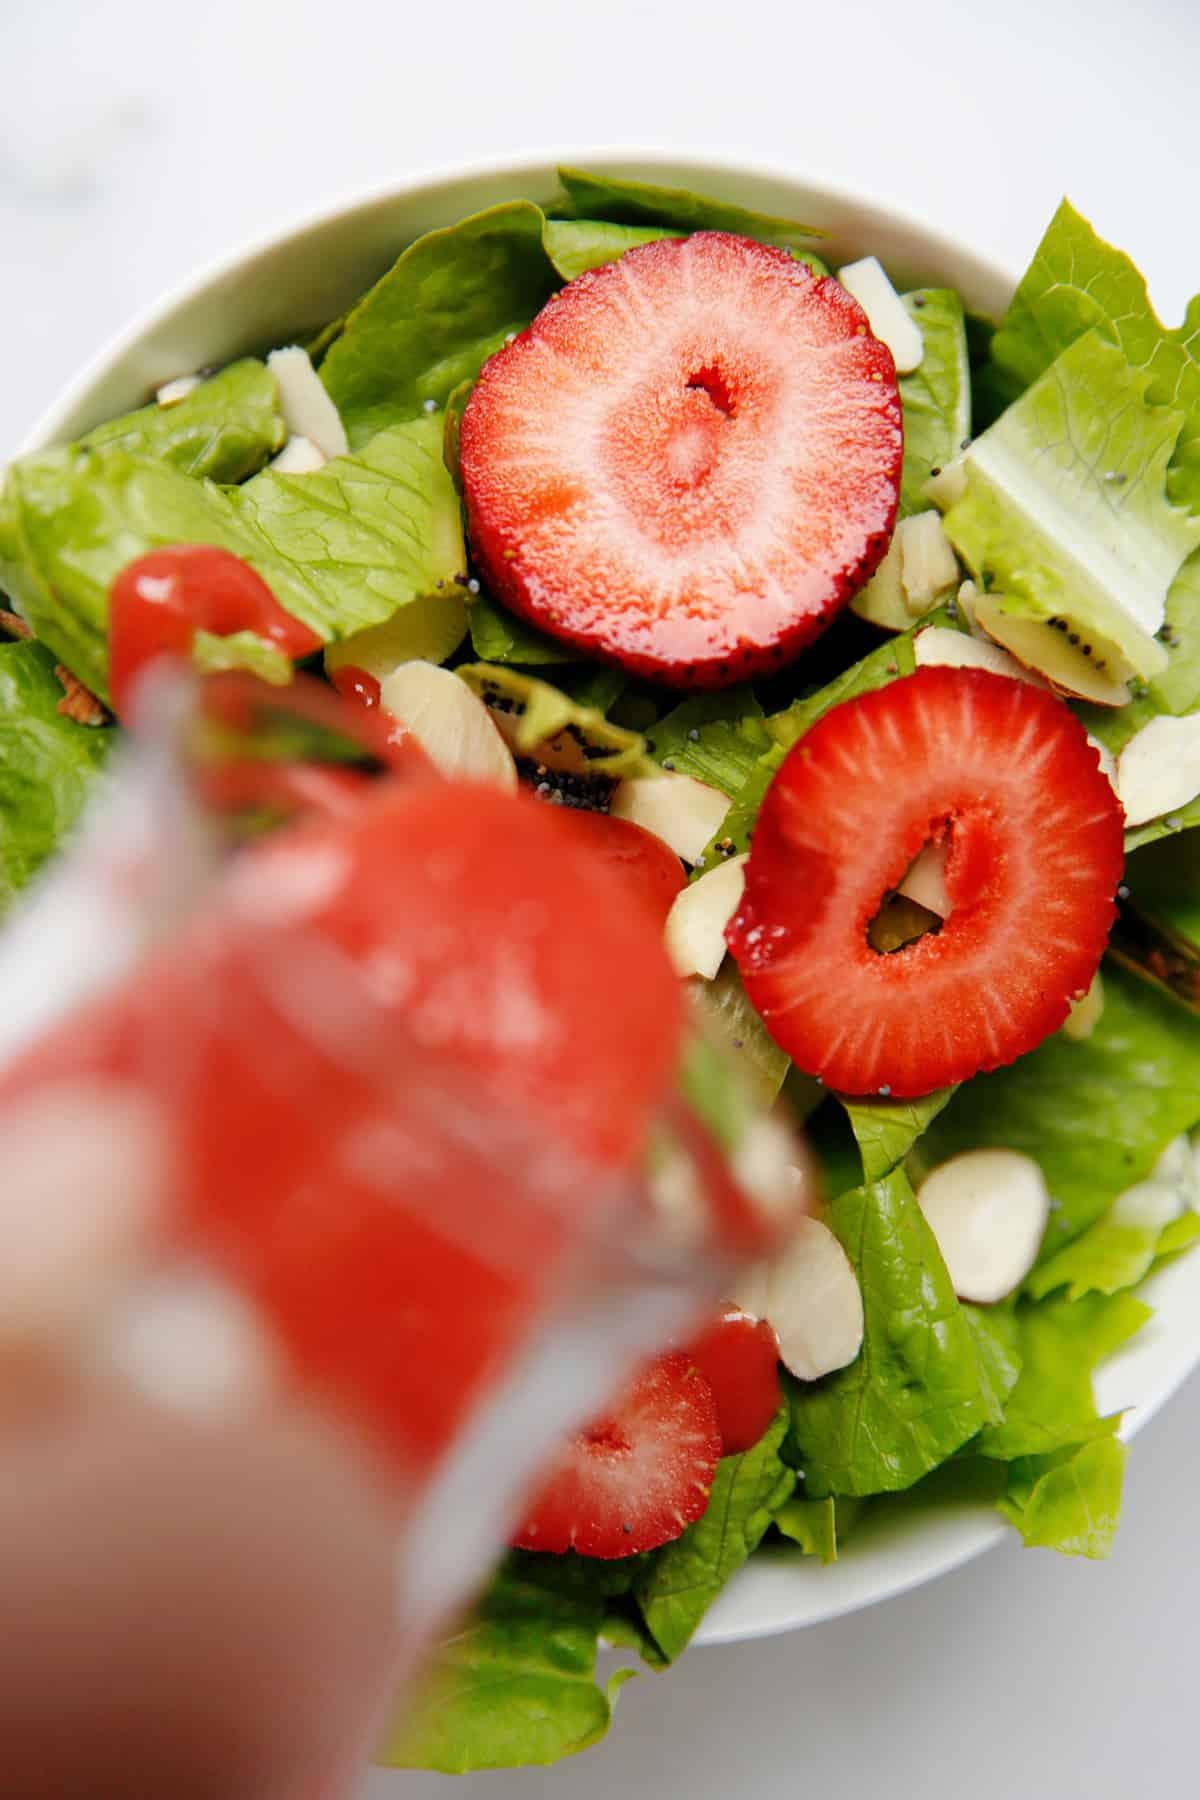 Strawberry vinaigrette recipe over summer salad